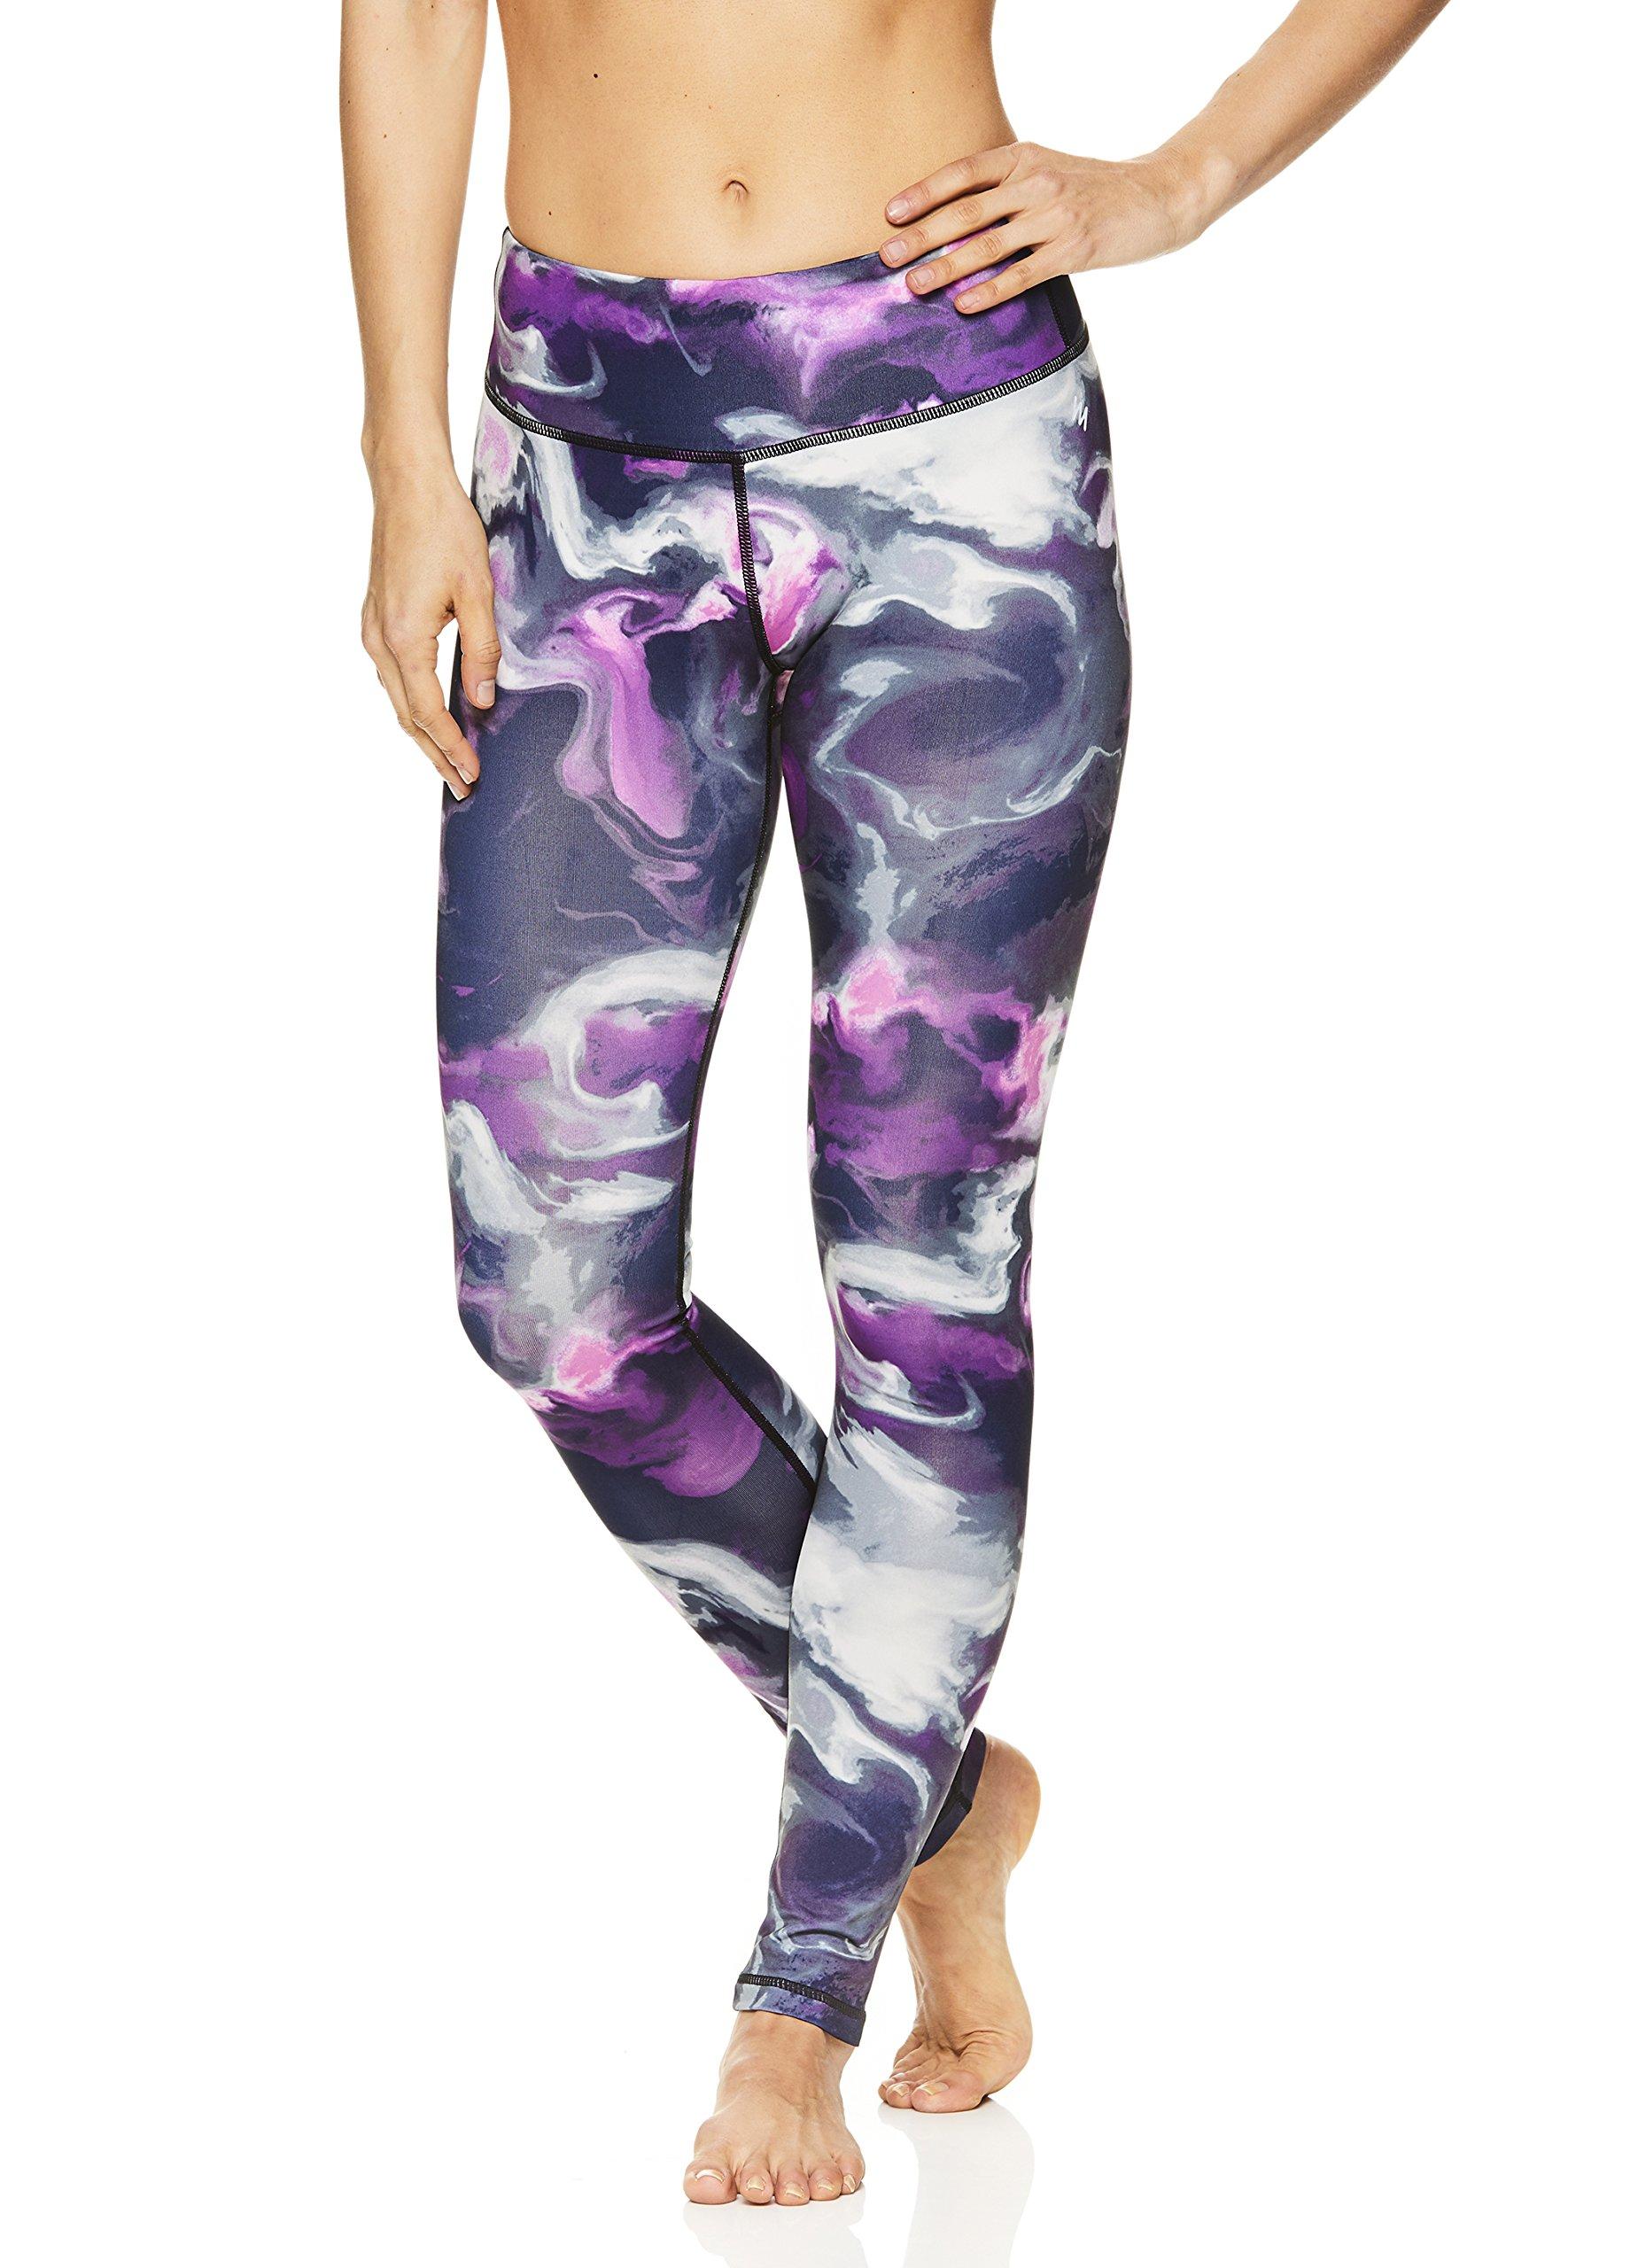 Nicole Miller Active Women's Flekka Printed Leggings - Performance Activewear Workout Pants - Coastal Black, Medium